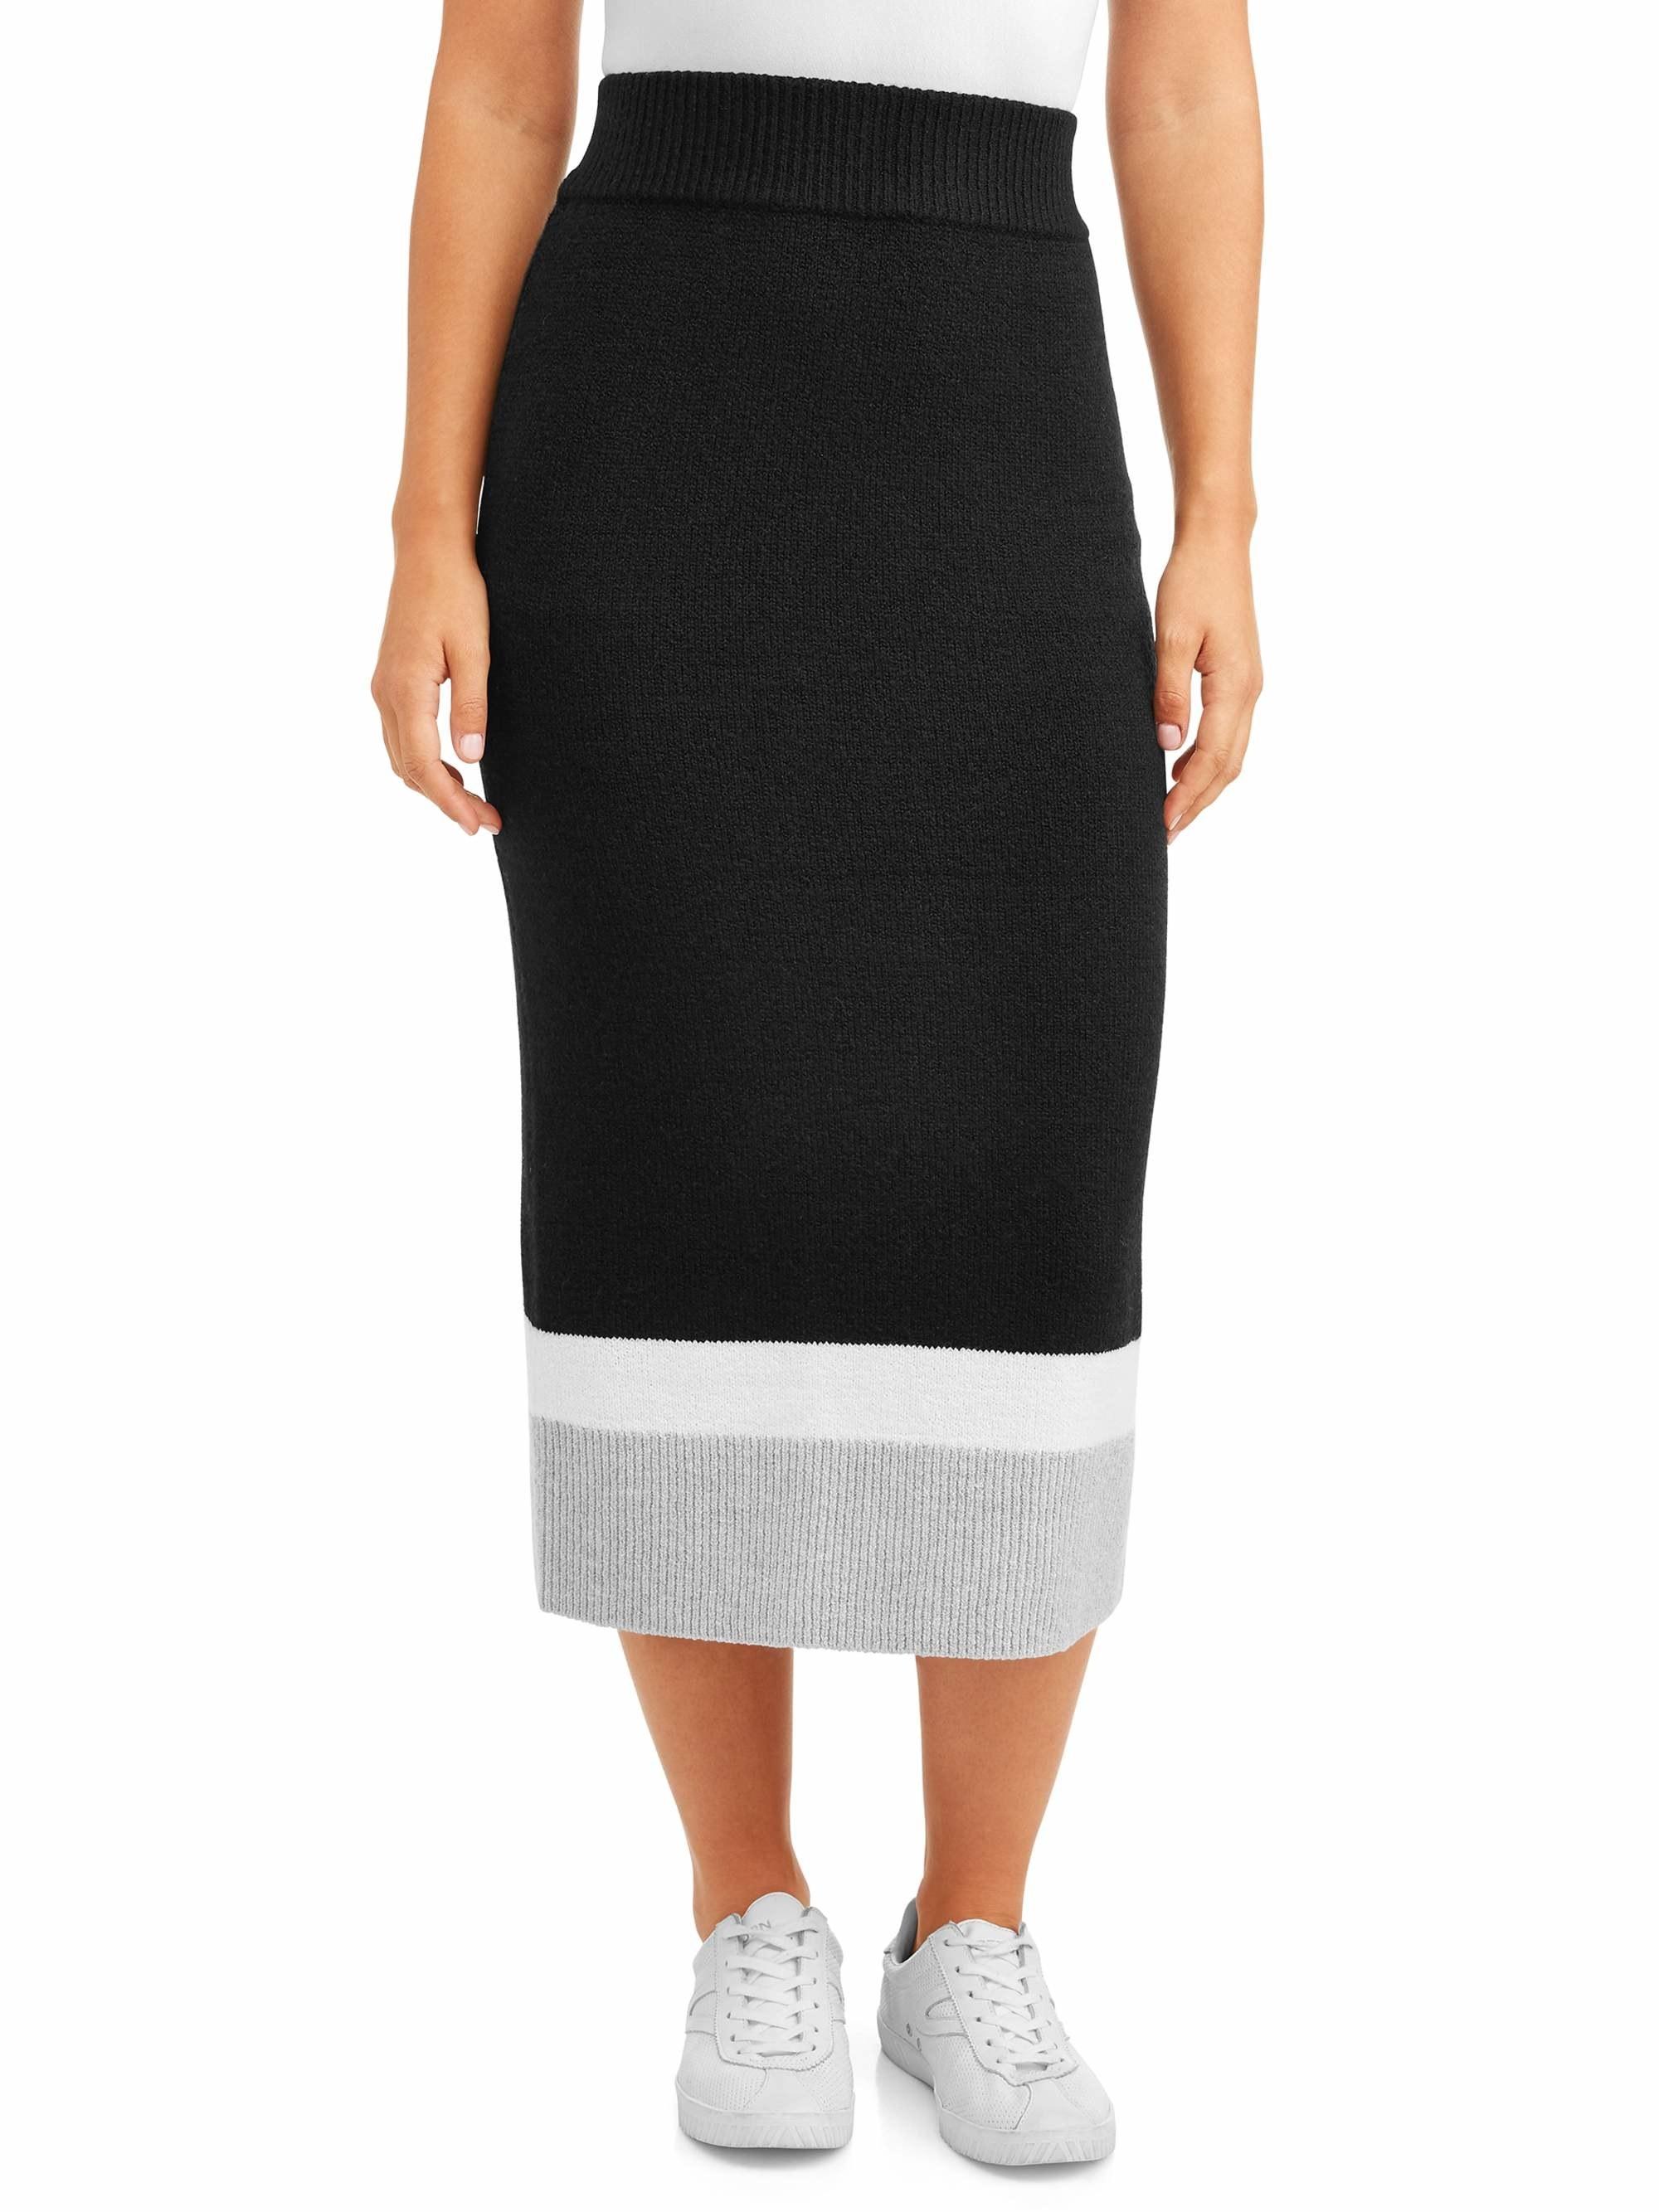 Model wears skirt in black soot colorblock